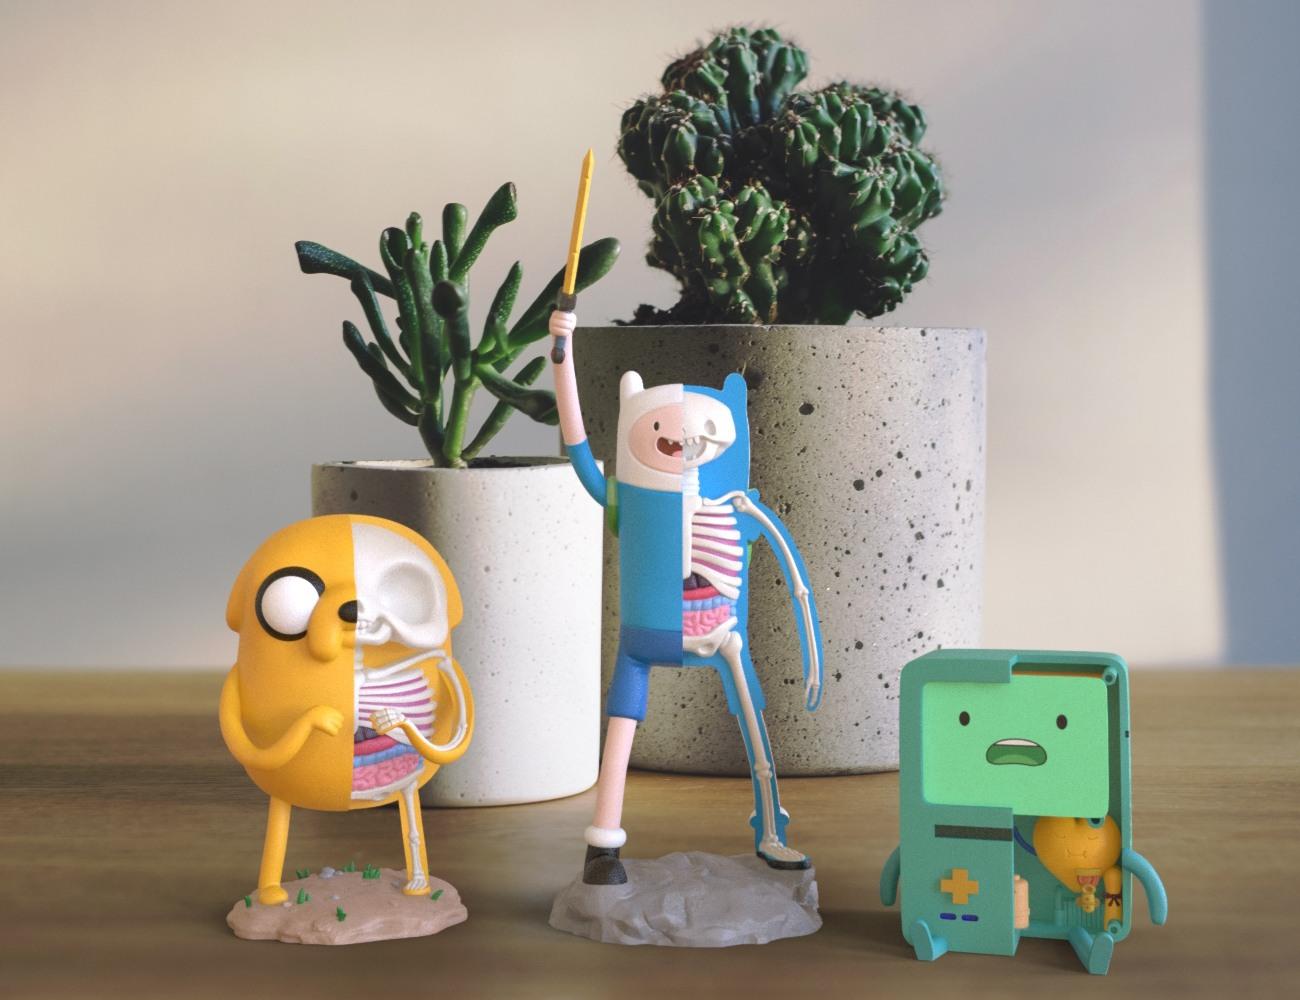 XXRAY+Collection+Cartoon+Figurines